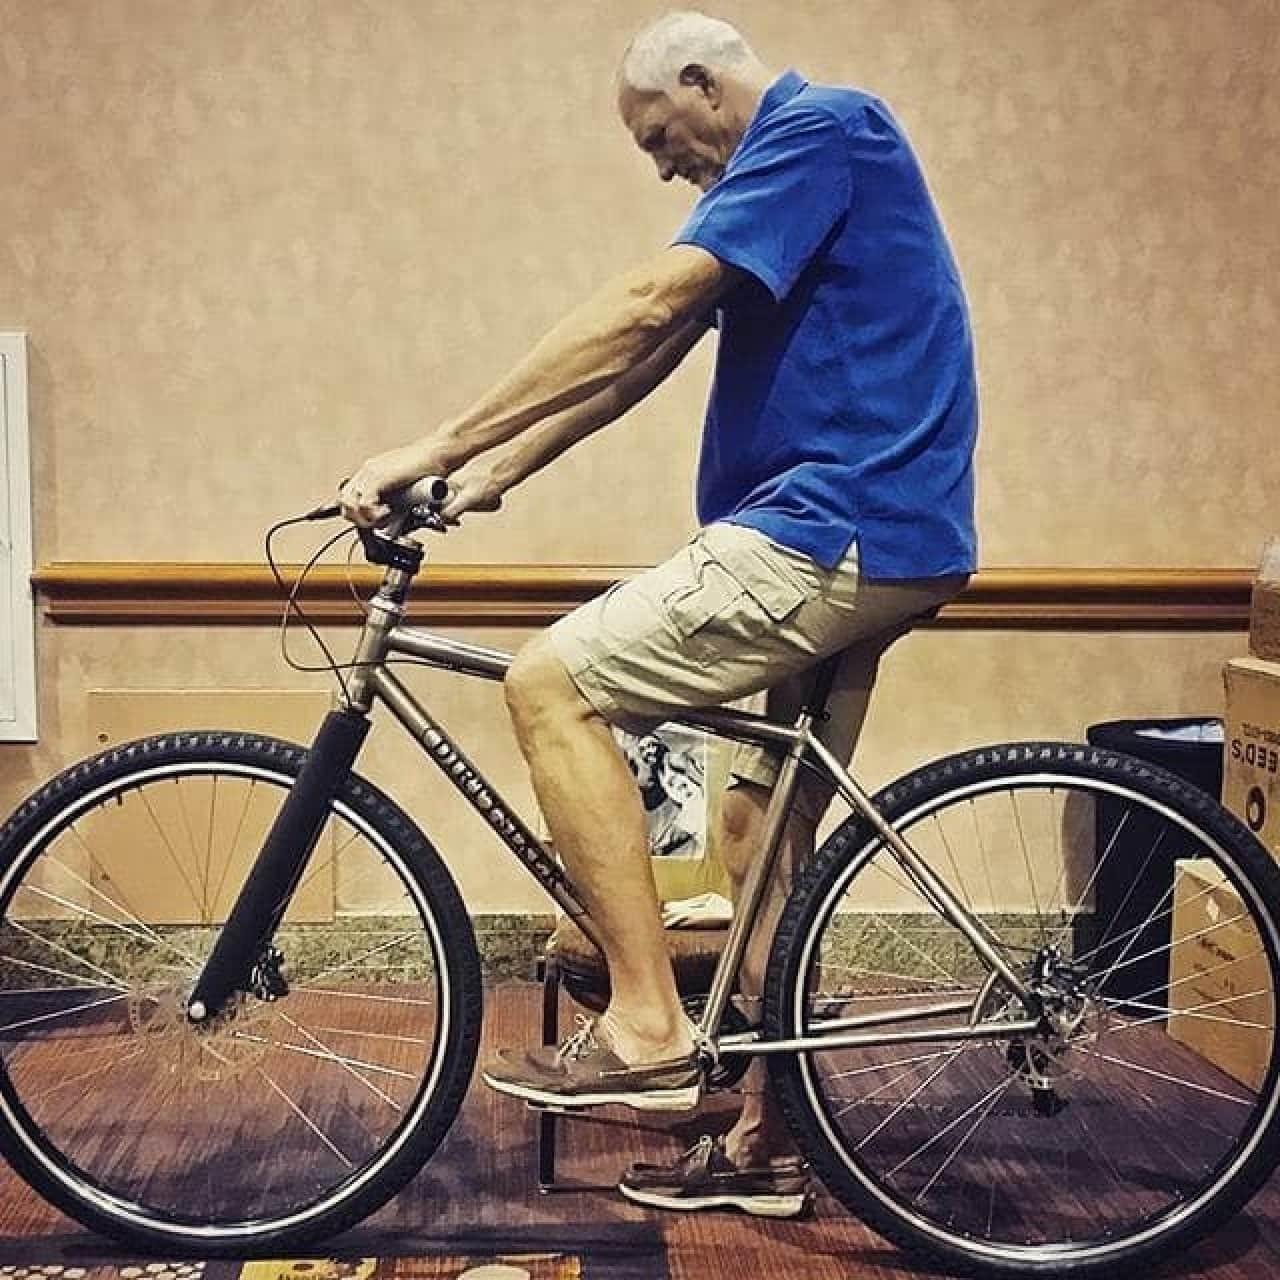 「DirtySixer」は、身長2メートル25センチまでに対応する36インチの自転車